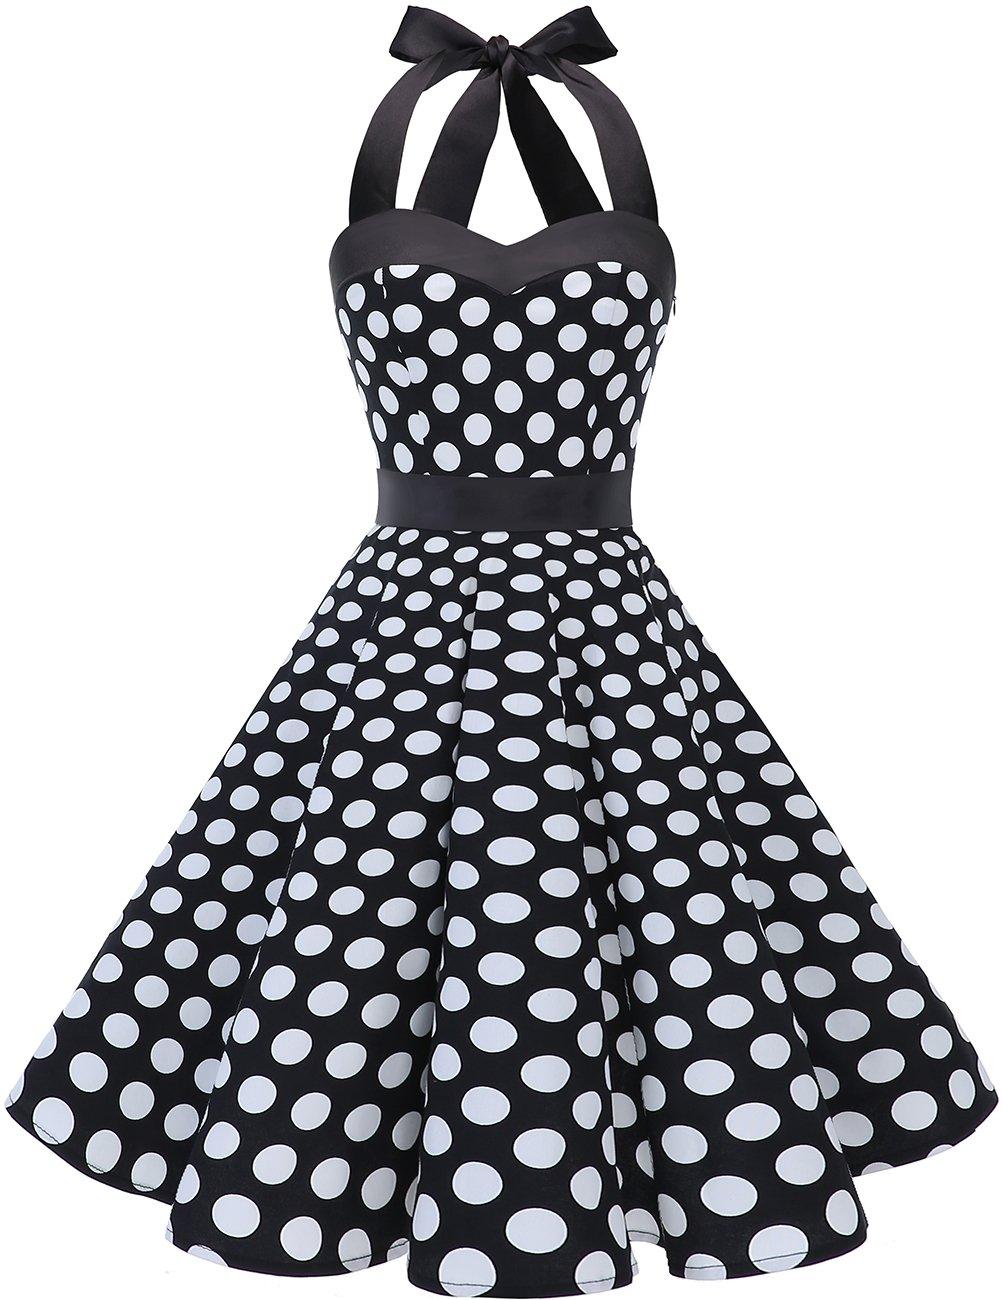 DRESSTELLS 50s Retro Halter Rockabilly Polka Dots Audrey Dress Cocktail Dress Black White Dot 2XL by DRESSTELLS